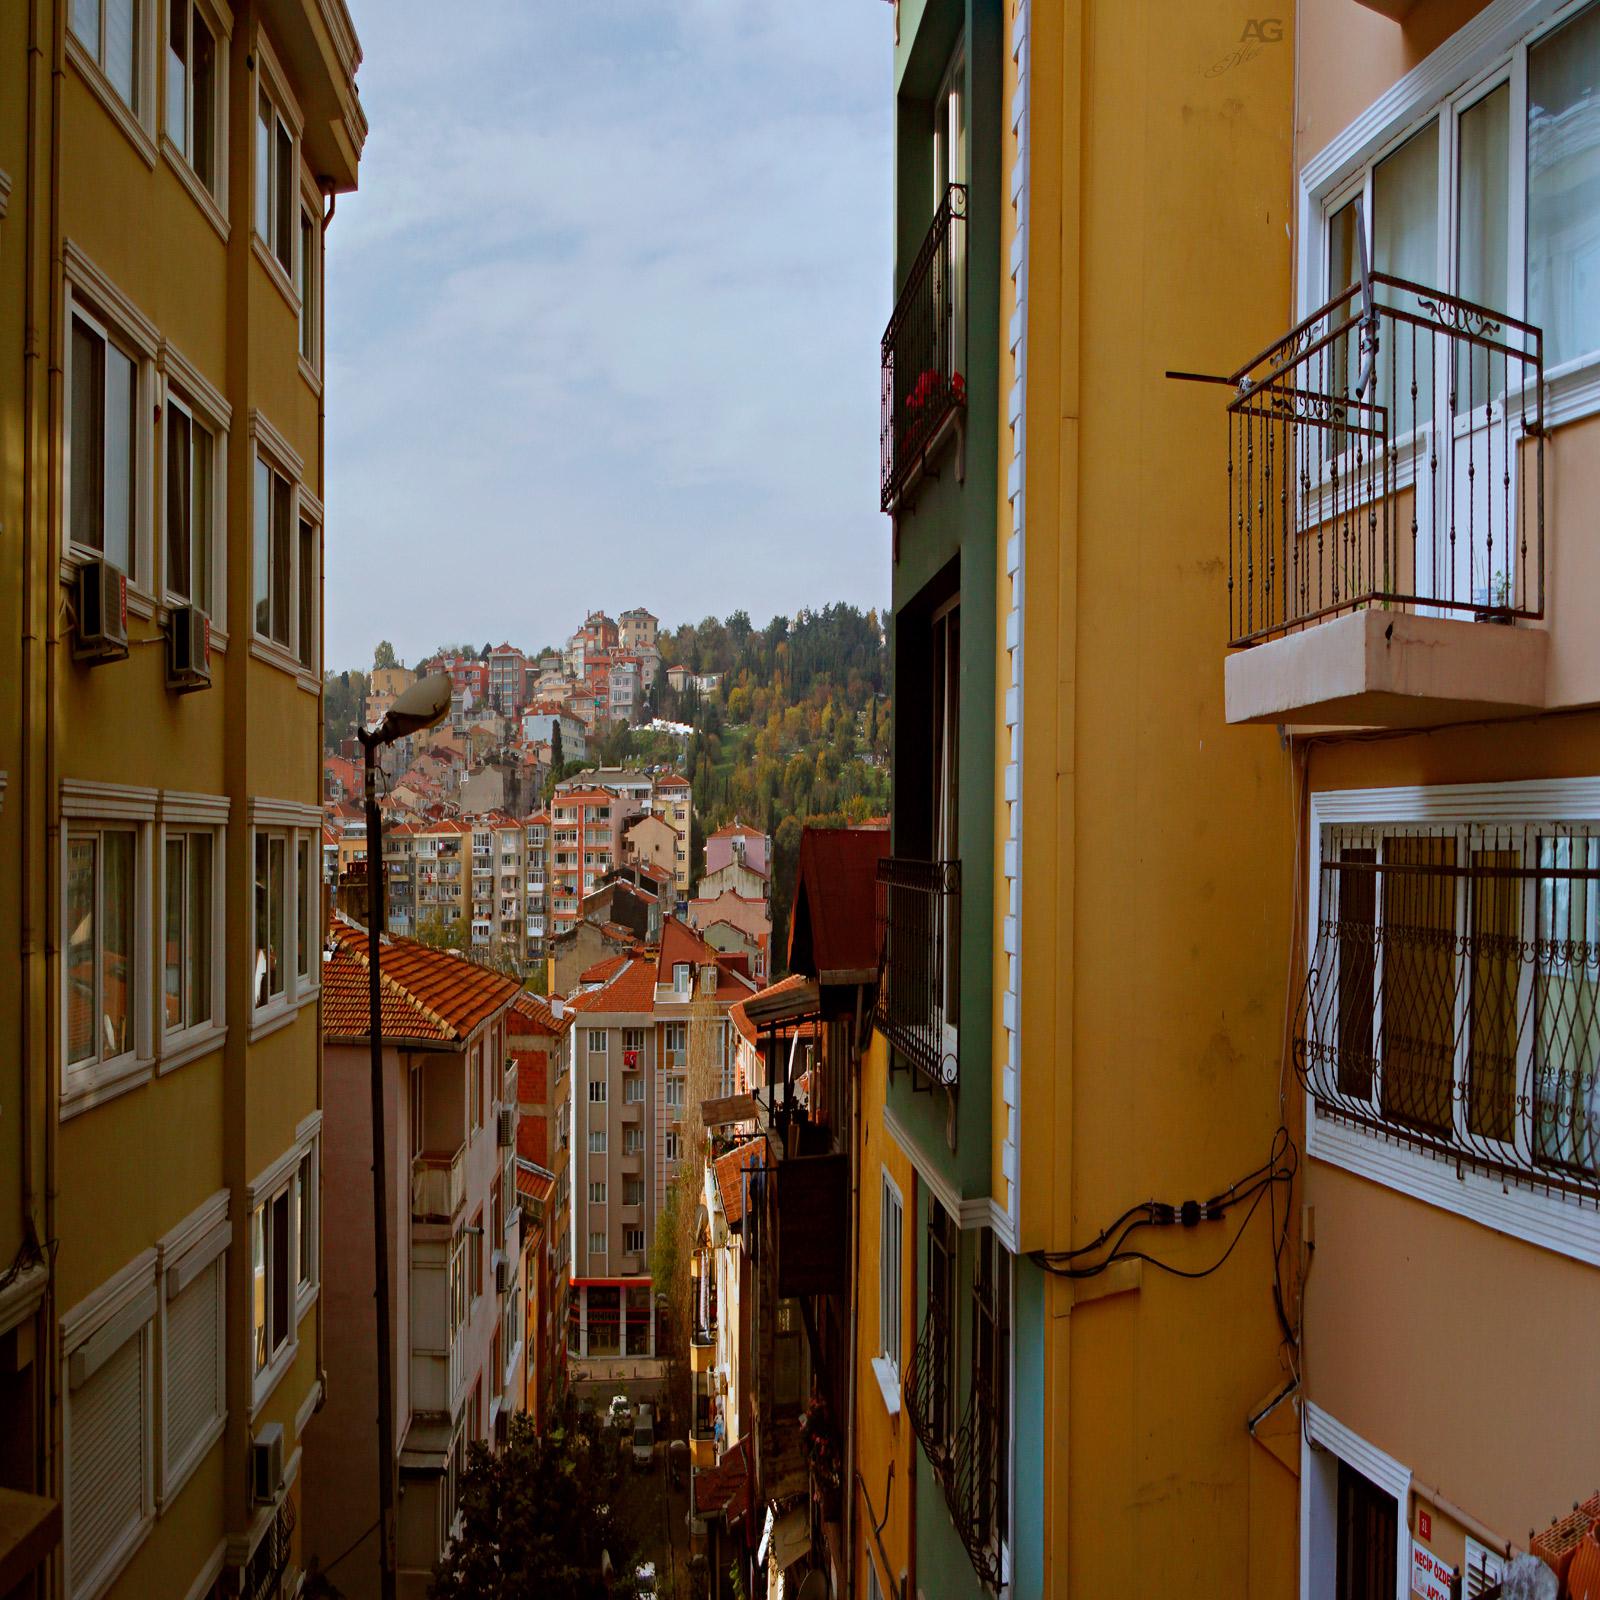 IstanbulNarrowStreetWithAViewDown_squished_1600